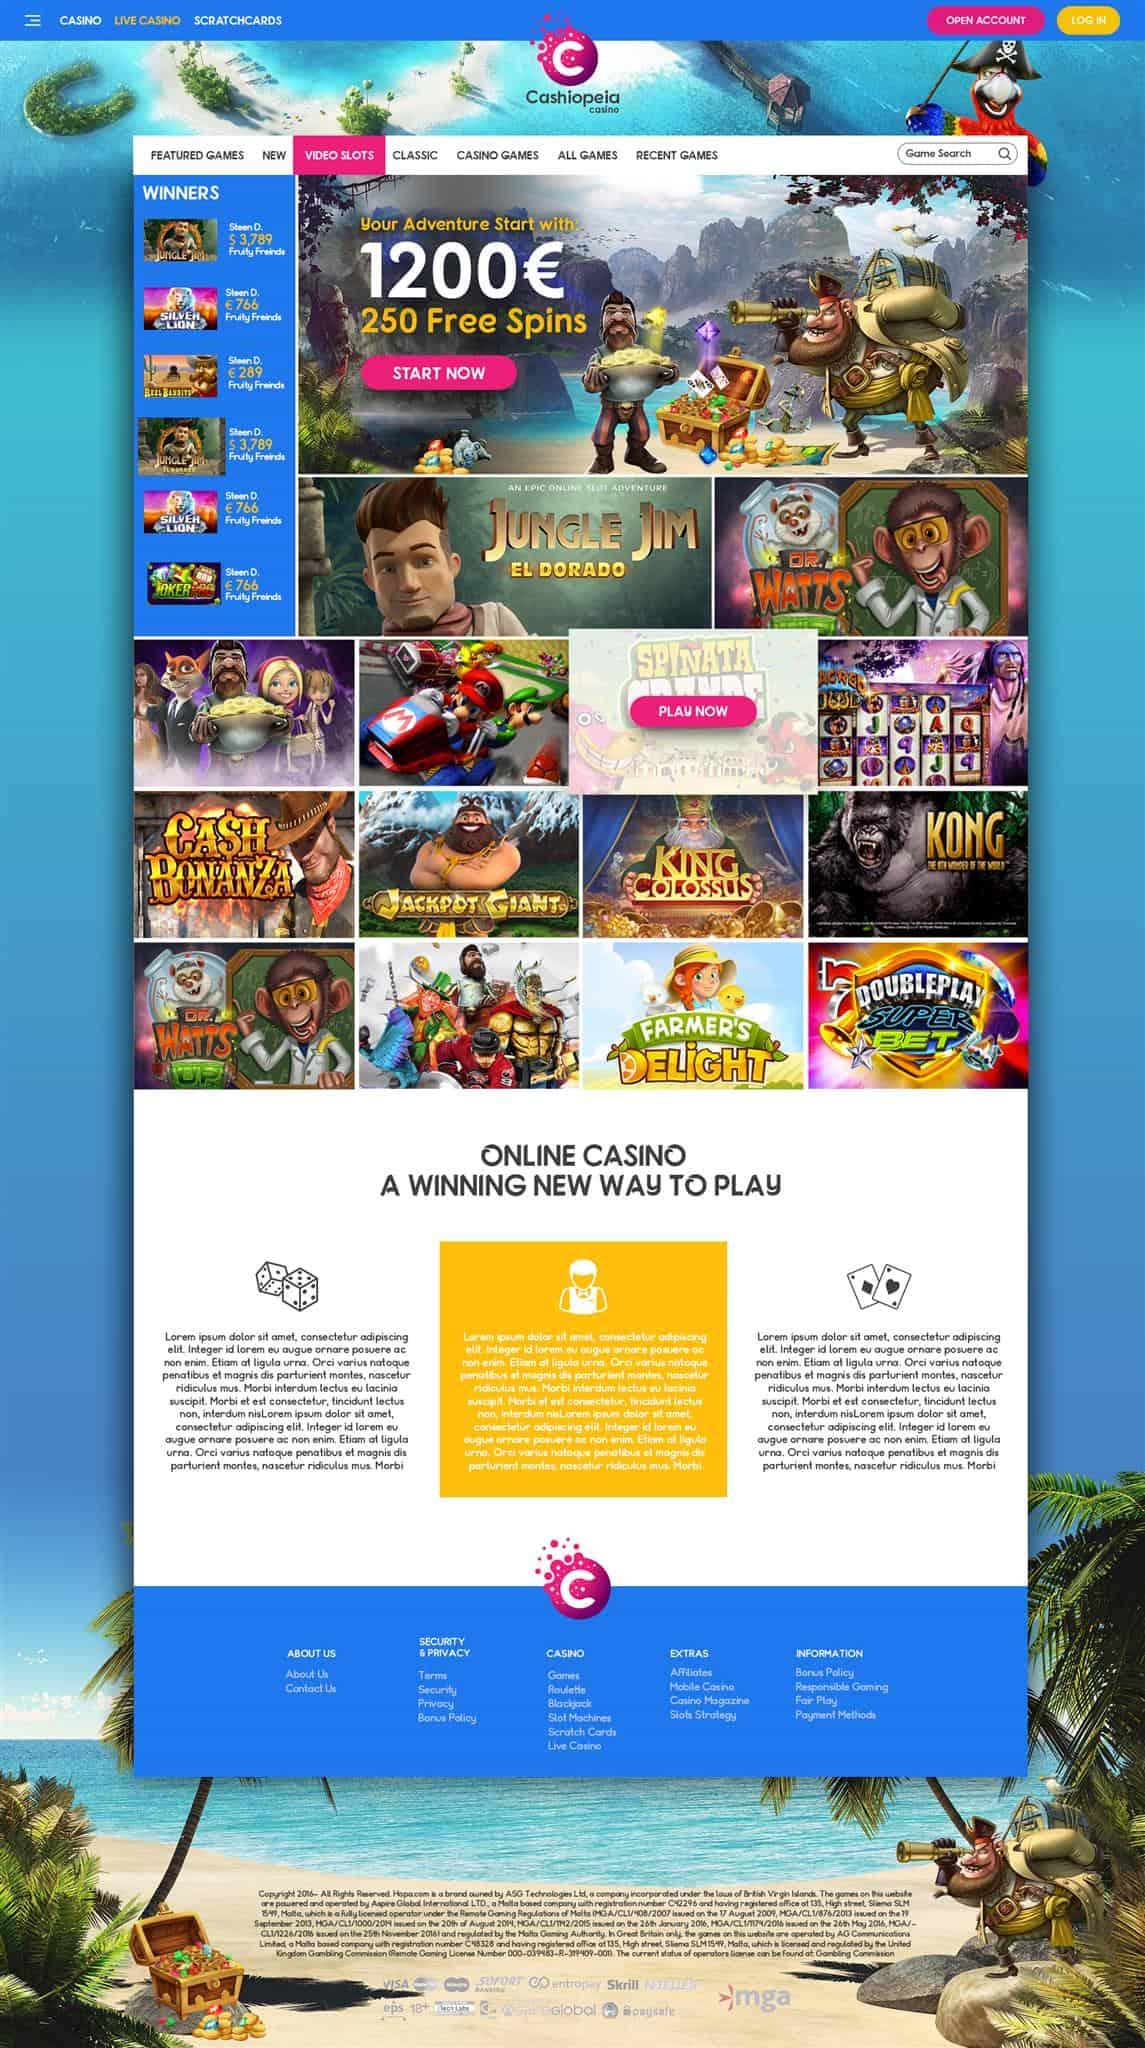 cashiopeia online casino vernieuwd